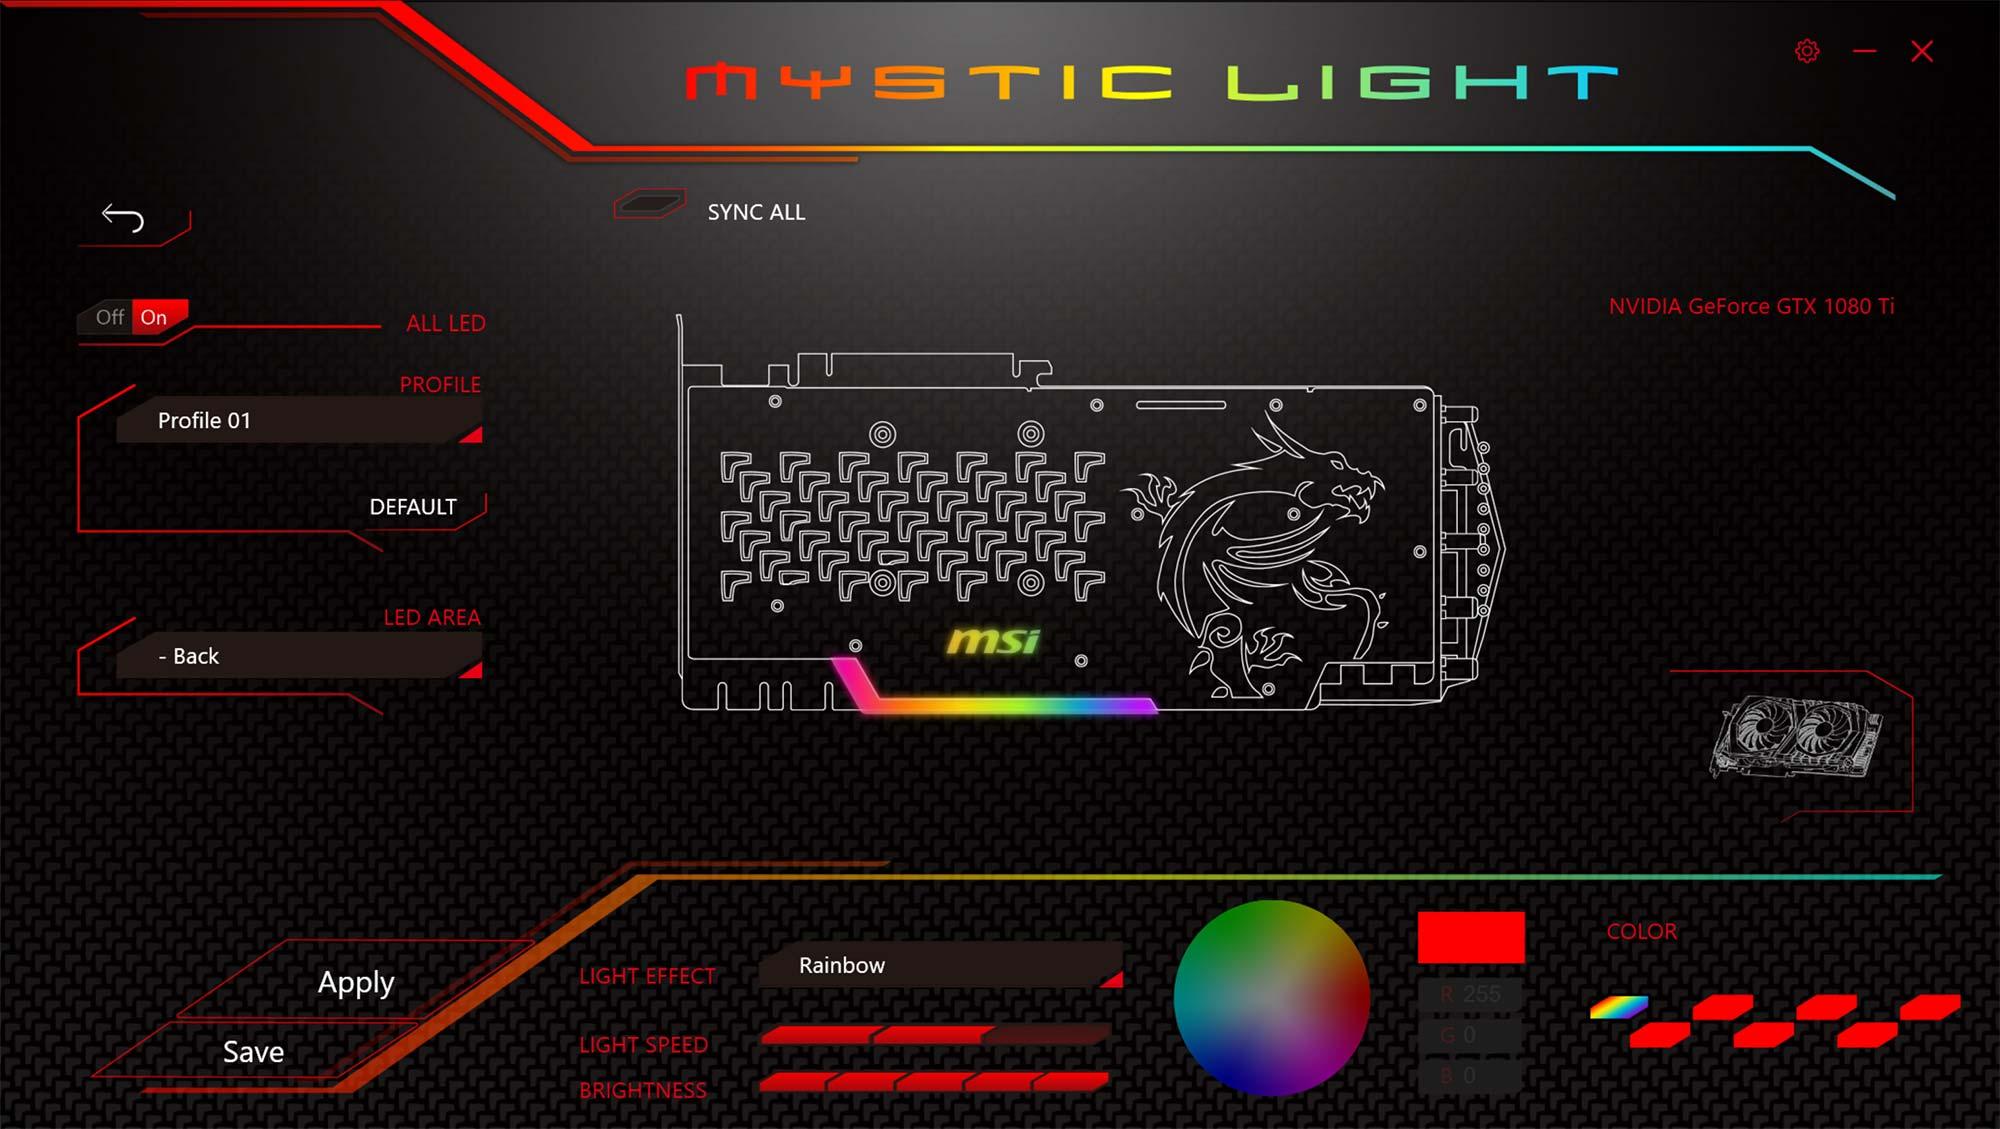 https://asset.msi.com/global/picture/image/feature/vga/NVIDIA/GTX1080Ti/Trio/TRIO-RGBsoftware.jpg